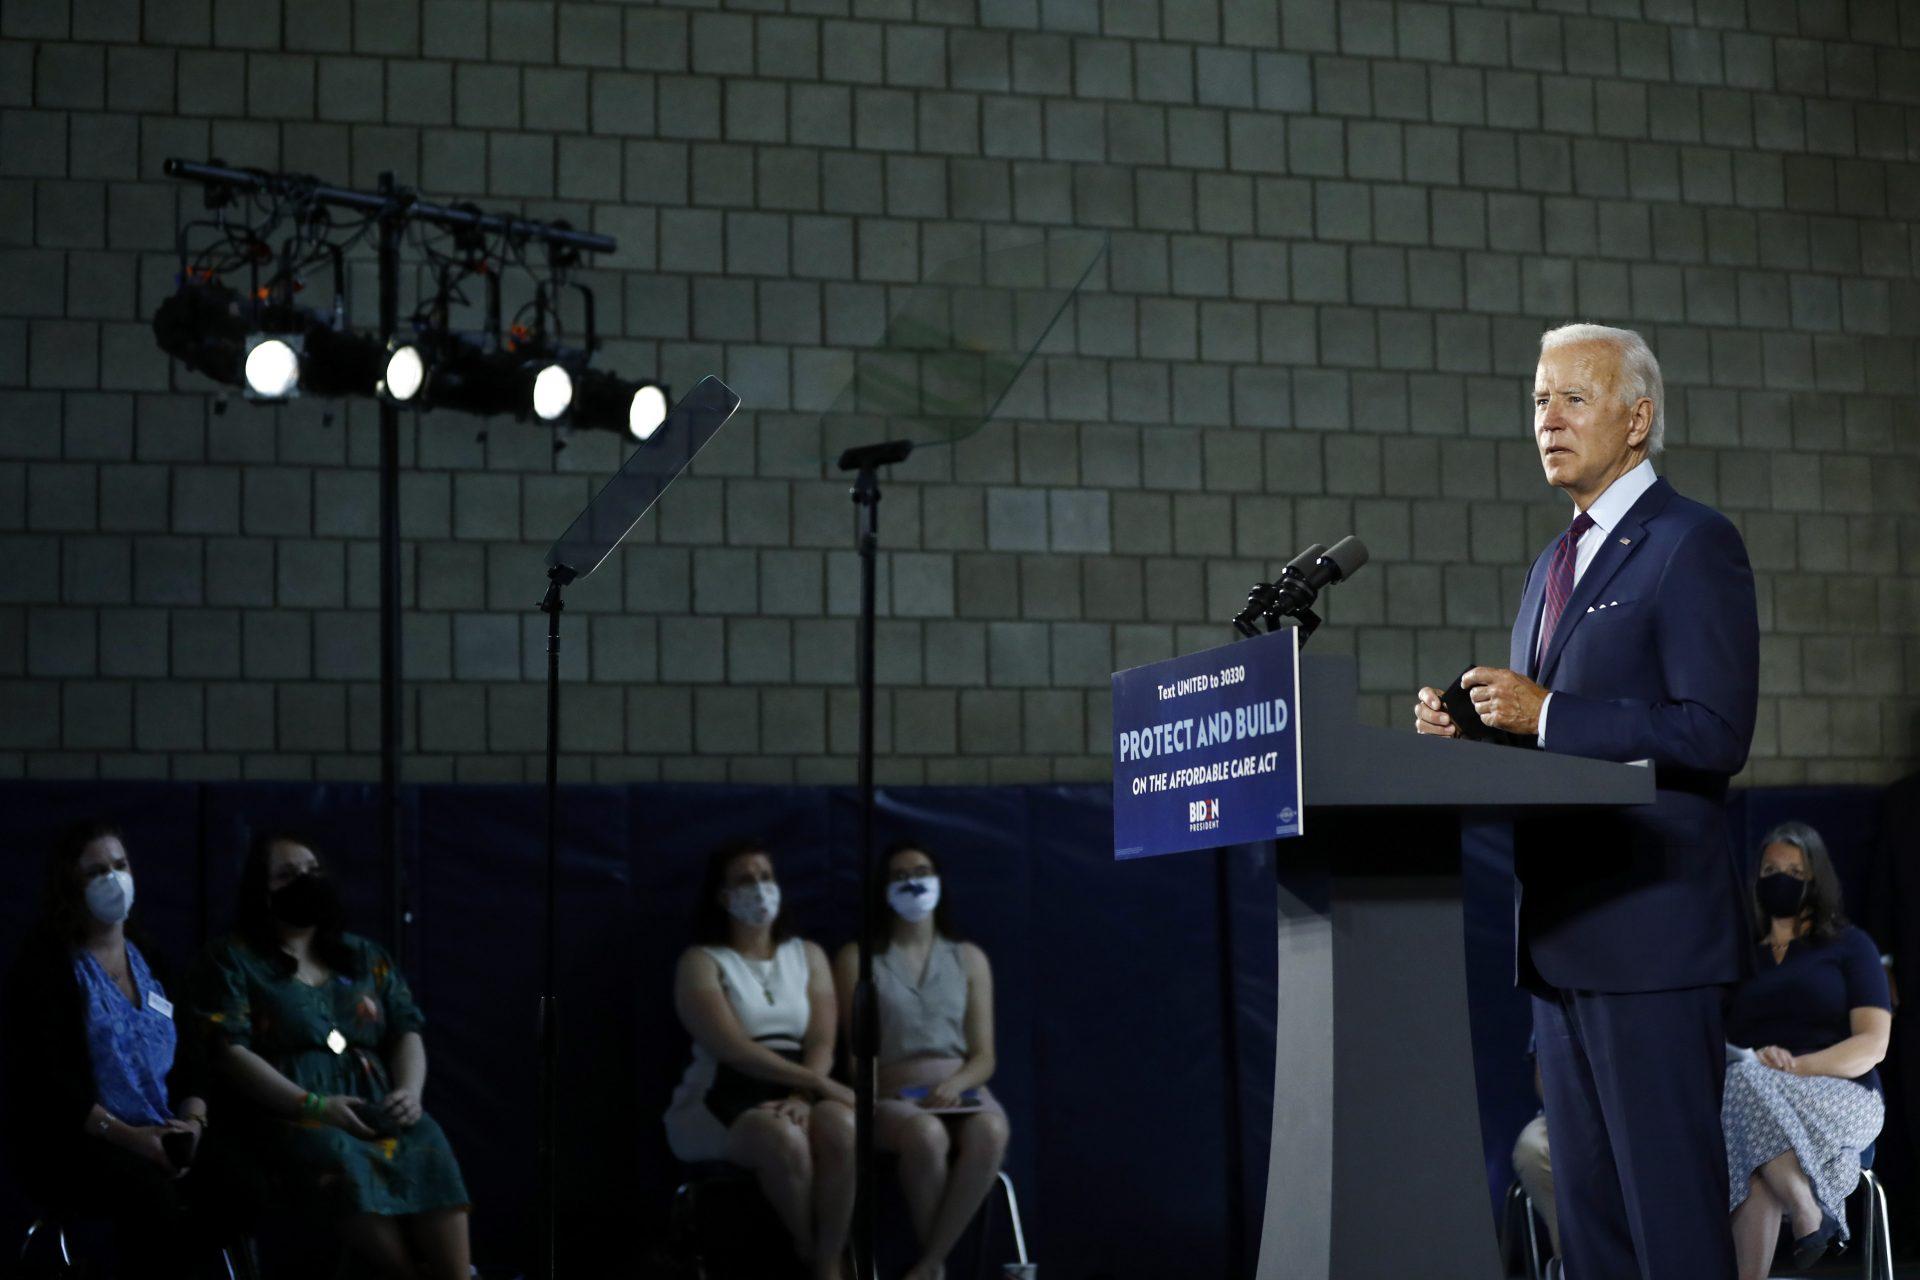 Democratic presidential candidate, former Vice President Joe Biden speaks during an event Thursday, June 25, 2020, in Lancaster, Pa.